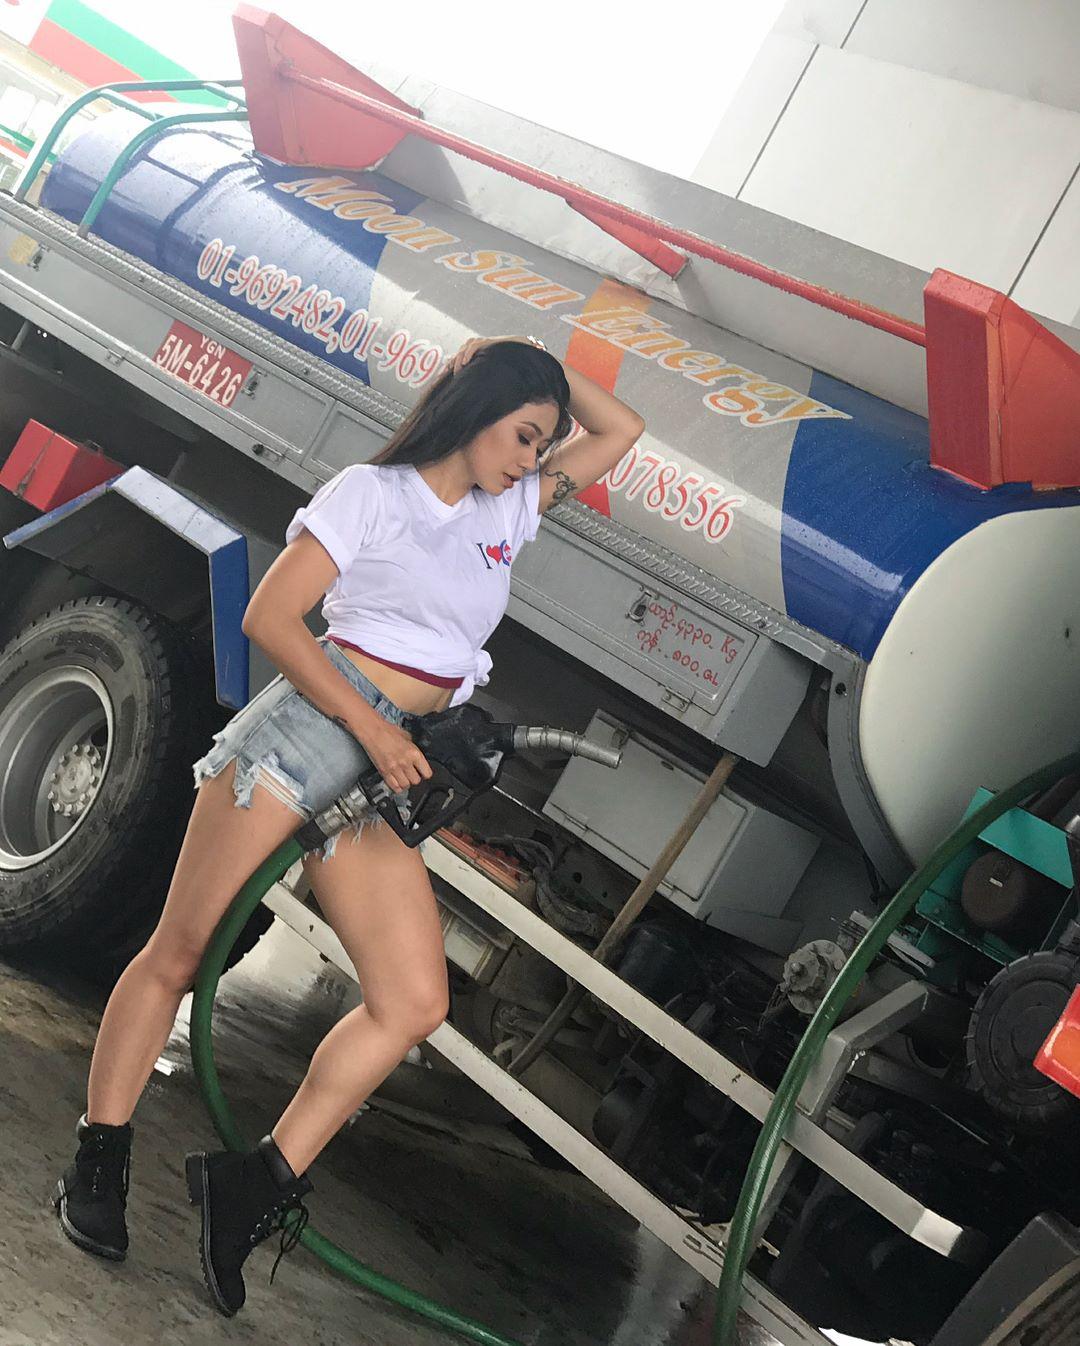 Thinzar Wint Kyaw TVC Photoshoot in Short Jean Pants